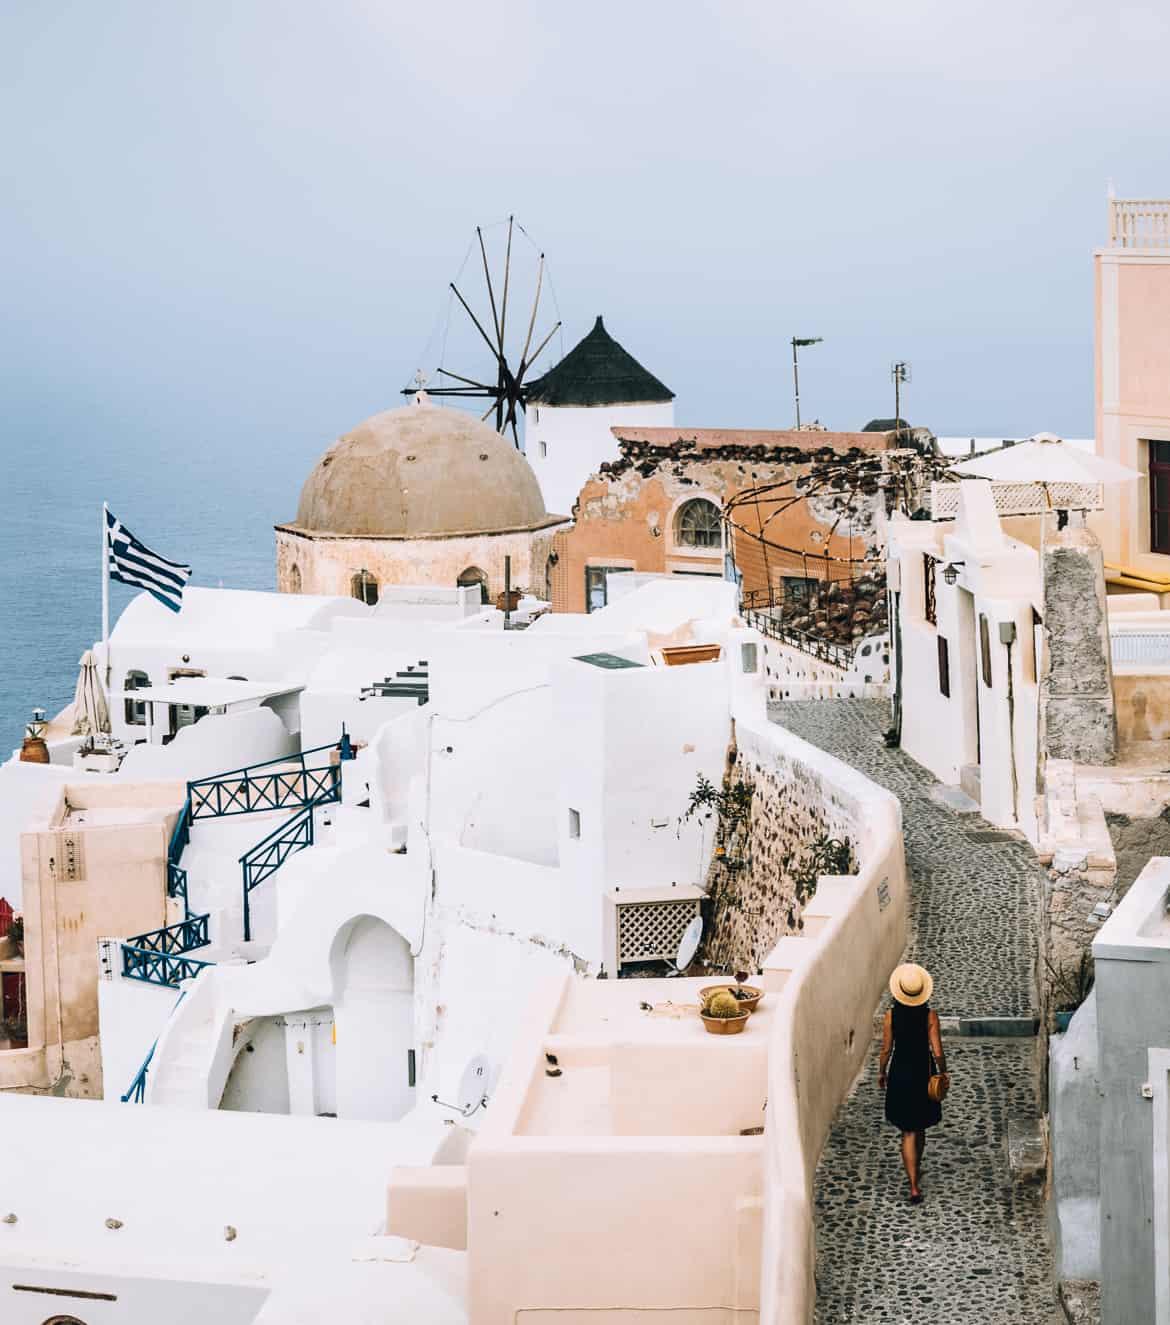 Santorini Travel Guide: Streifzüge in Oia